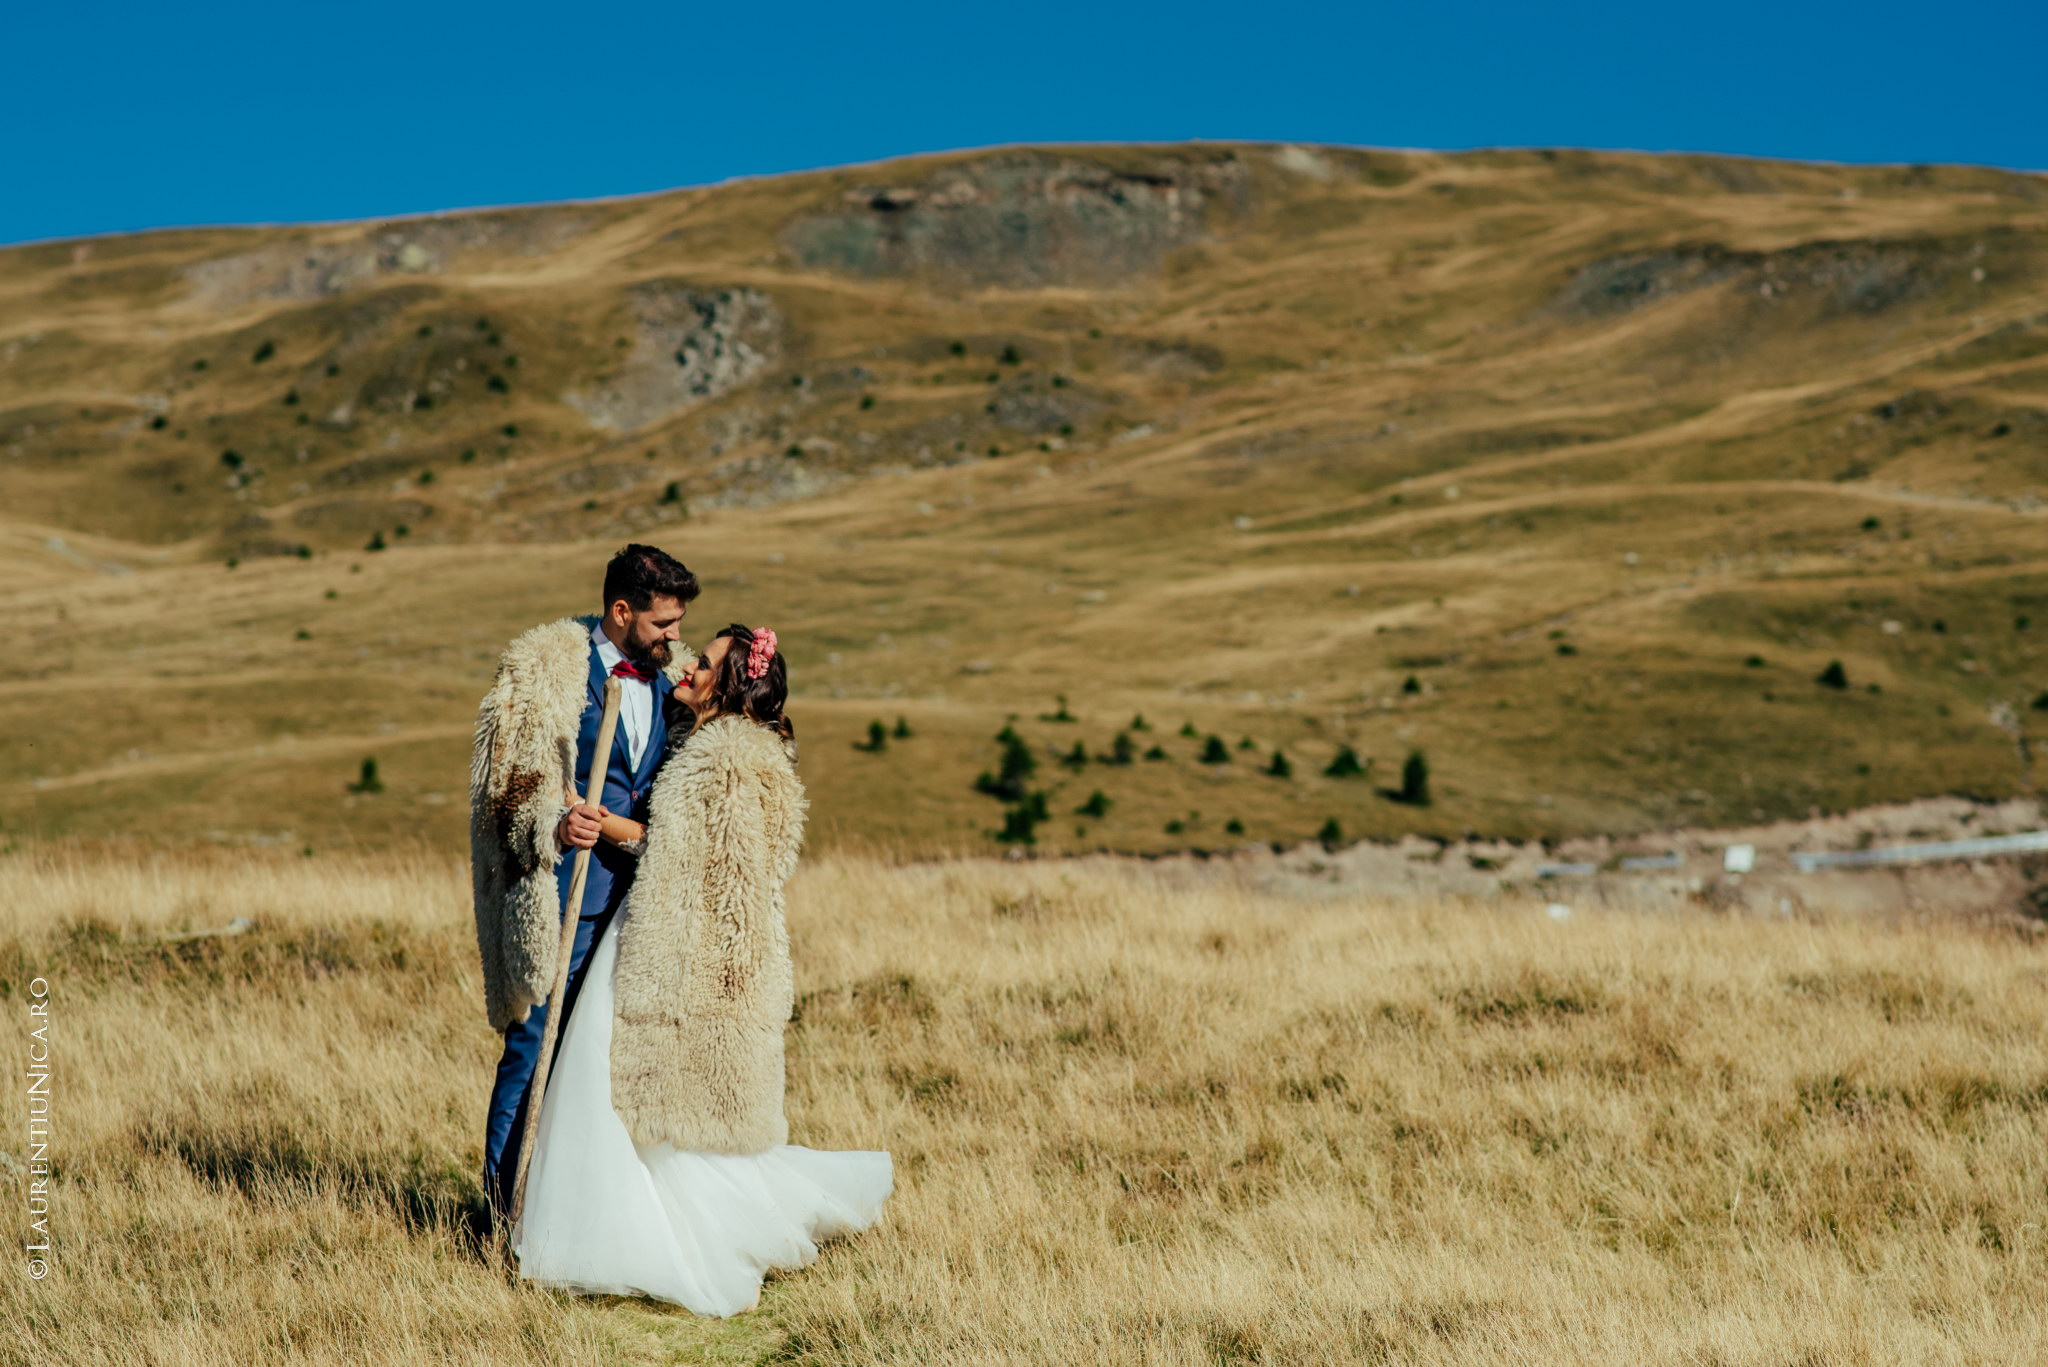 aida si alin fotograf nunta laurentiu nica transalpina 07 - Aida & Alin | Fotografii After Wedding | Transalpina - Muntii Parang